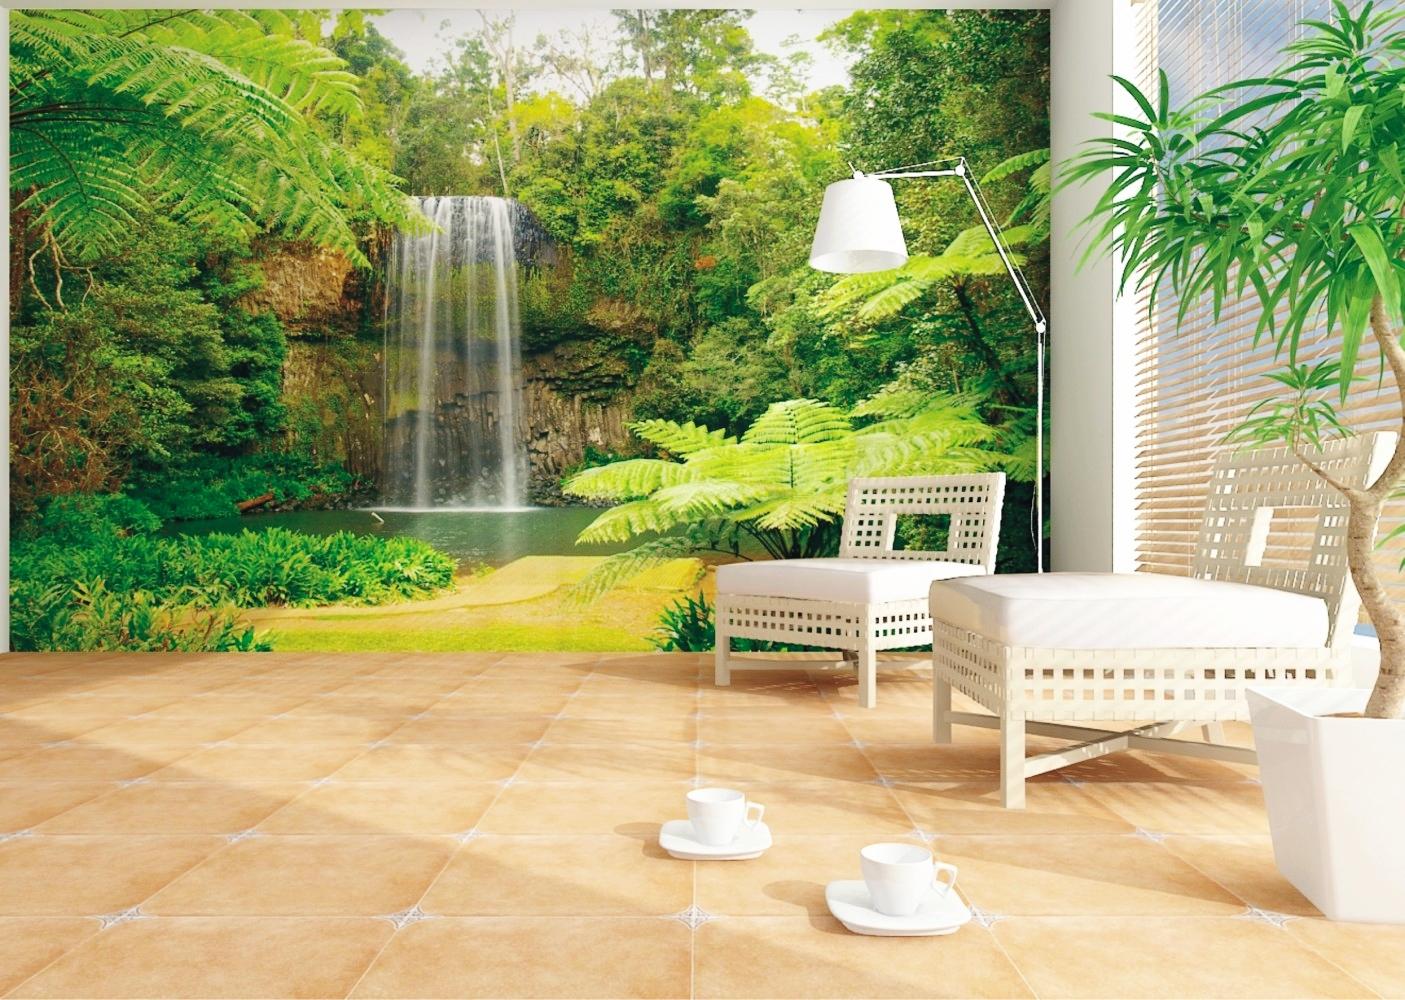 make-the-home-a-calm-environment